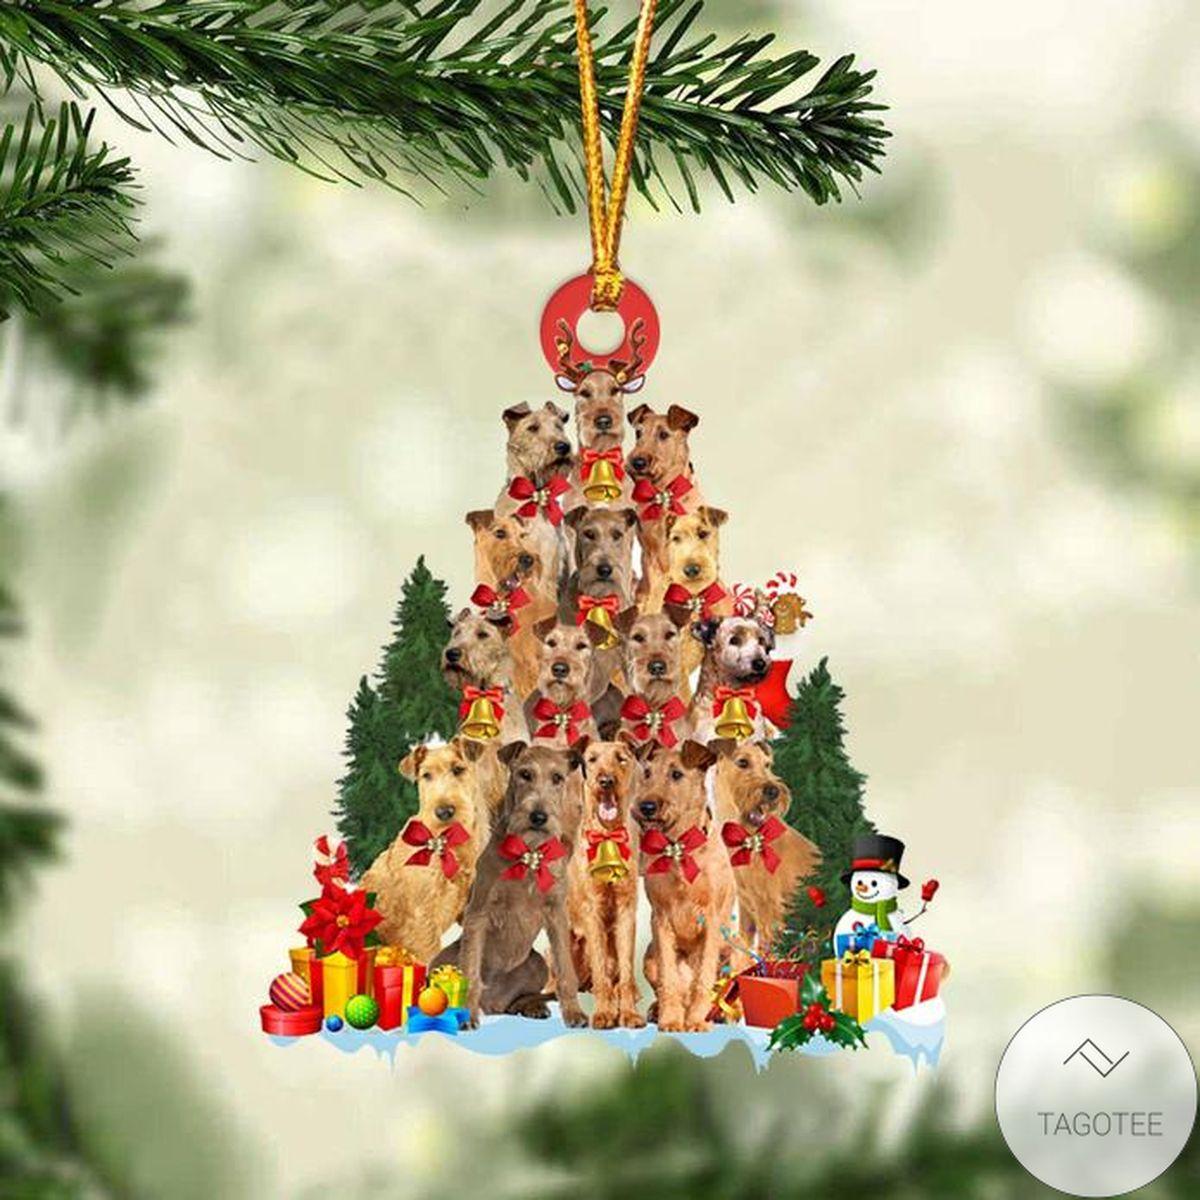 Irish Terrier Dog Christmas Tree Ornament